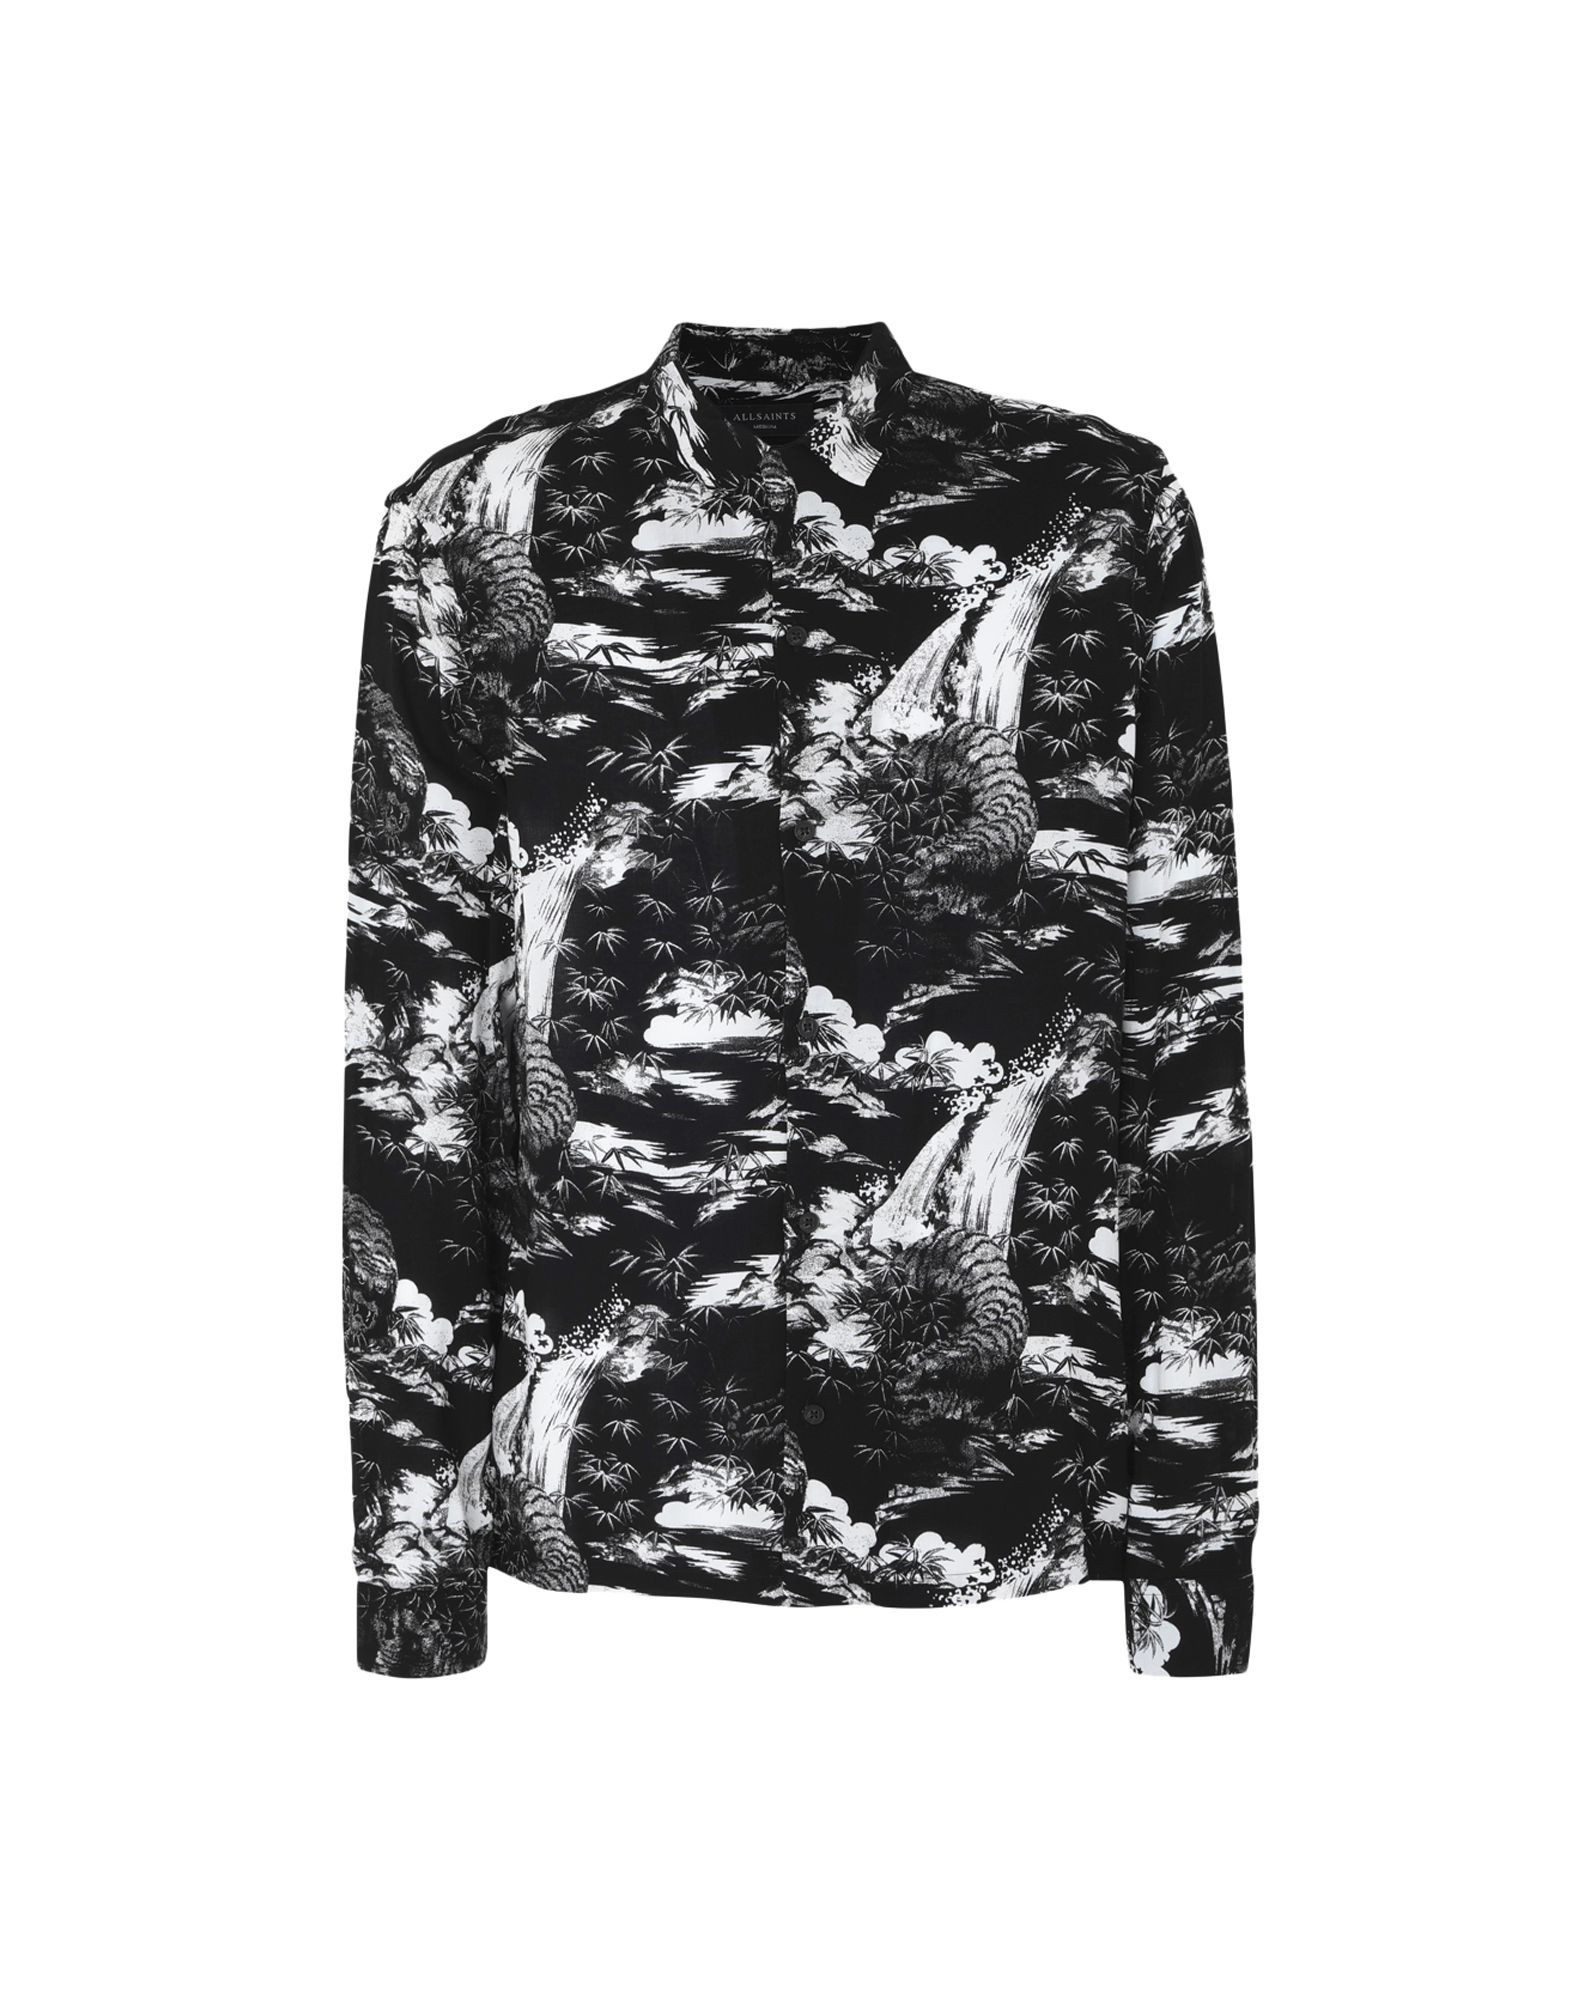 e61ed83eb3c4b Allsaints Sunda Ls Shirt - Patterned Shirt - Men Allsaints Patterned Shirts  online on YOOX United States - 38805261QP